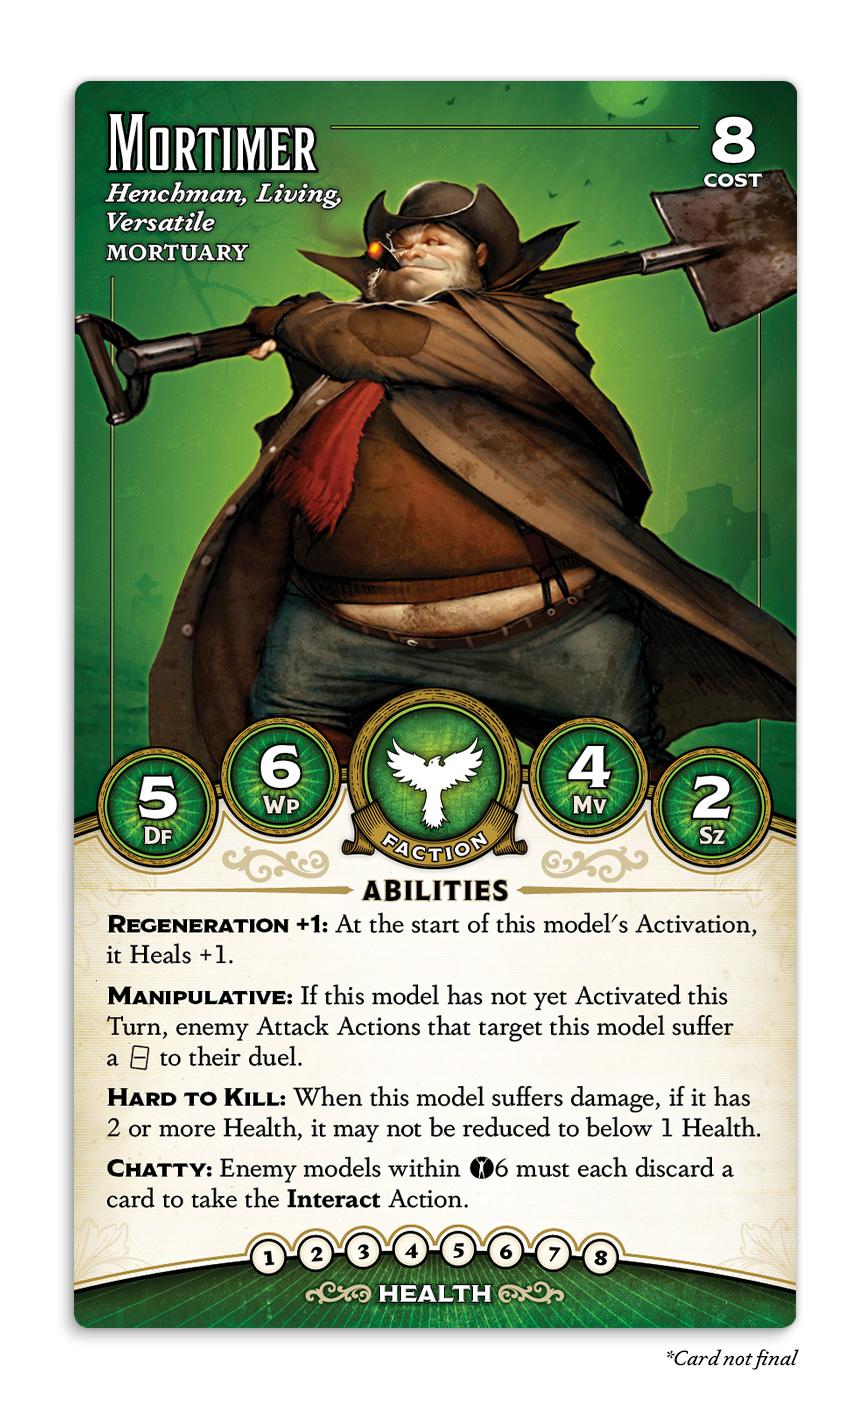 WaldosWeekly_0206_Mortimer_Card-Front.jpg